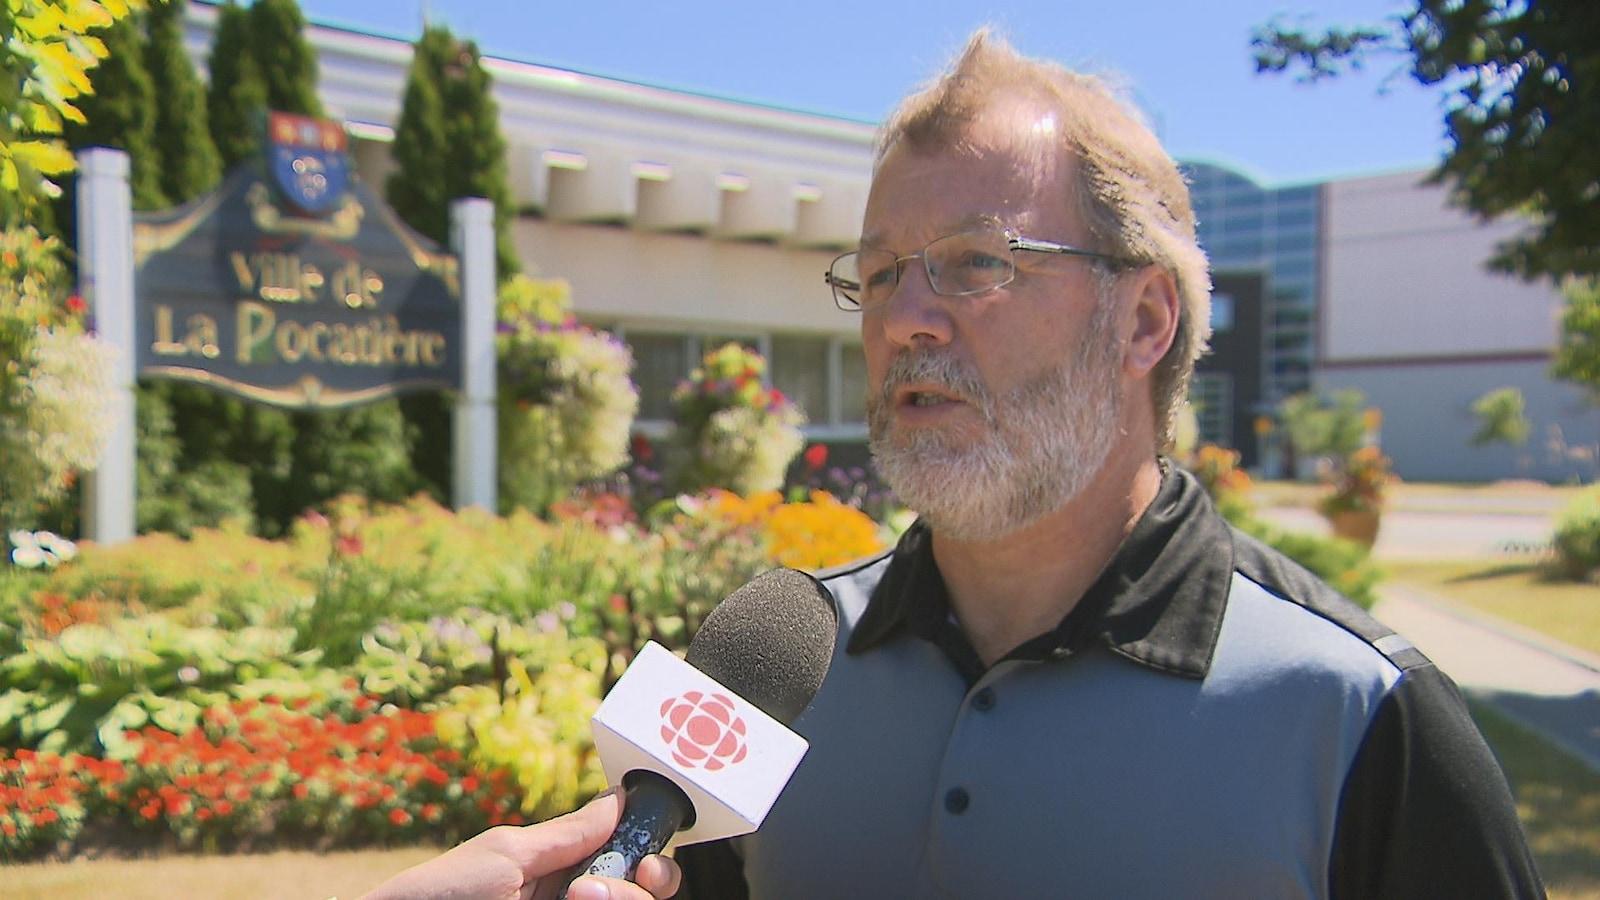 Le maire de La Pocatière, Sylvain Hudon, en entrevue avec Radio-Canada.